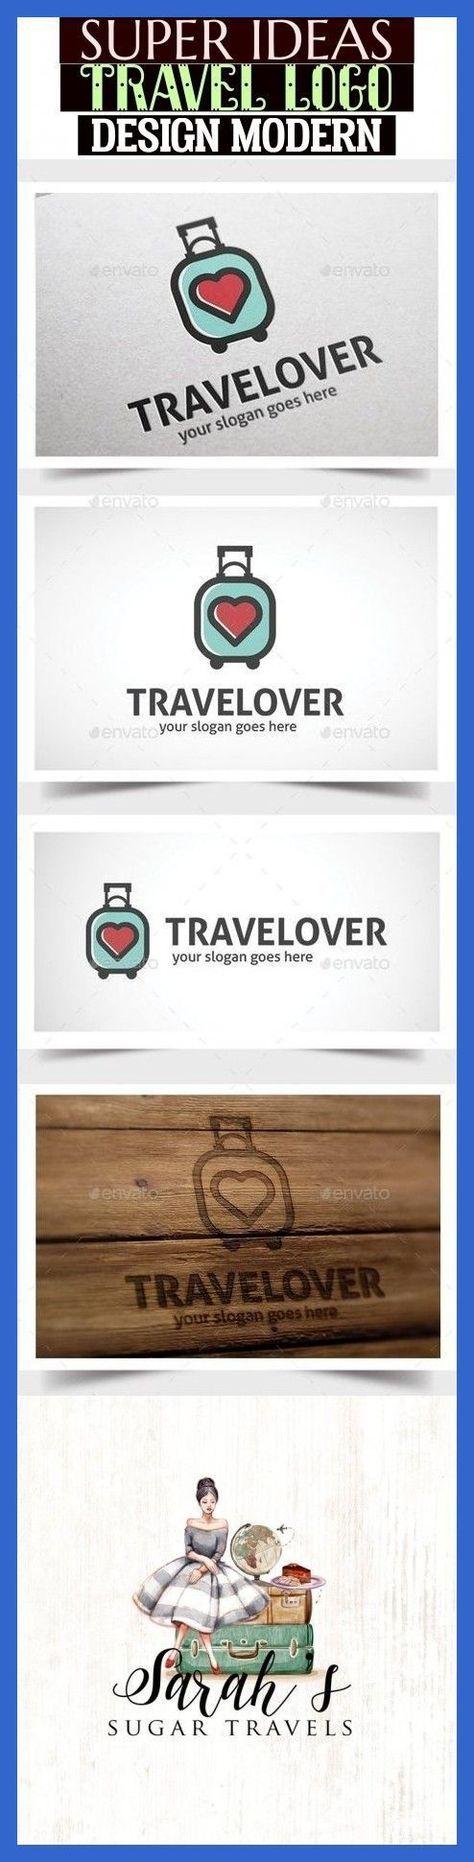 travel idea logo More Than 50 Super Ideas Travel Logo Design Modern #travelideas... -  - #design #Idea #Ideas #Logo #Modern #super #travel #travelideas